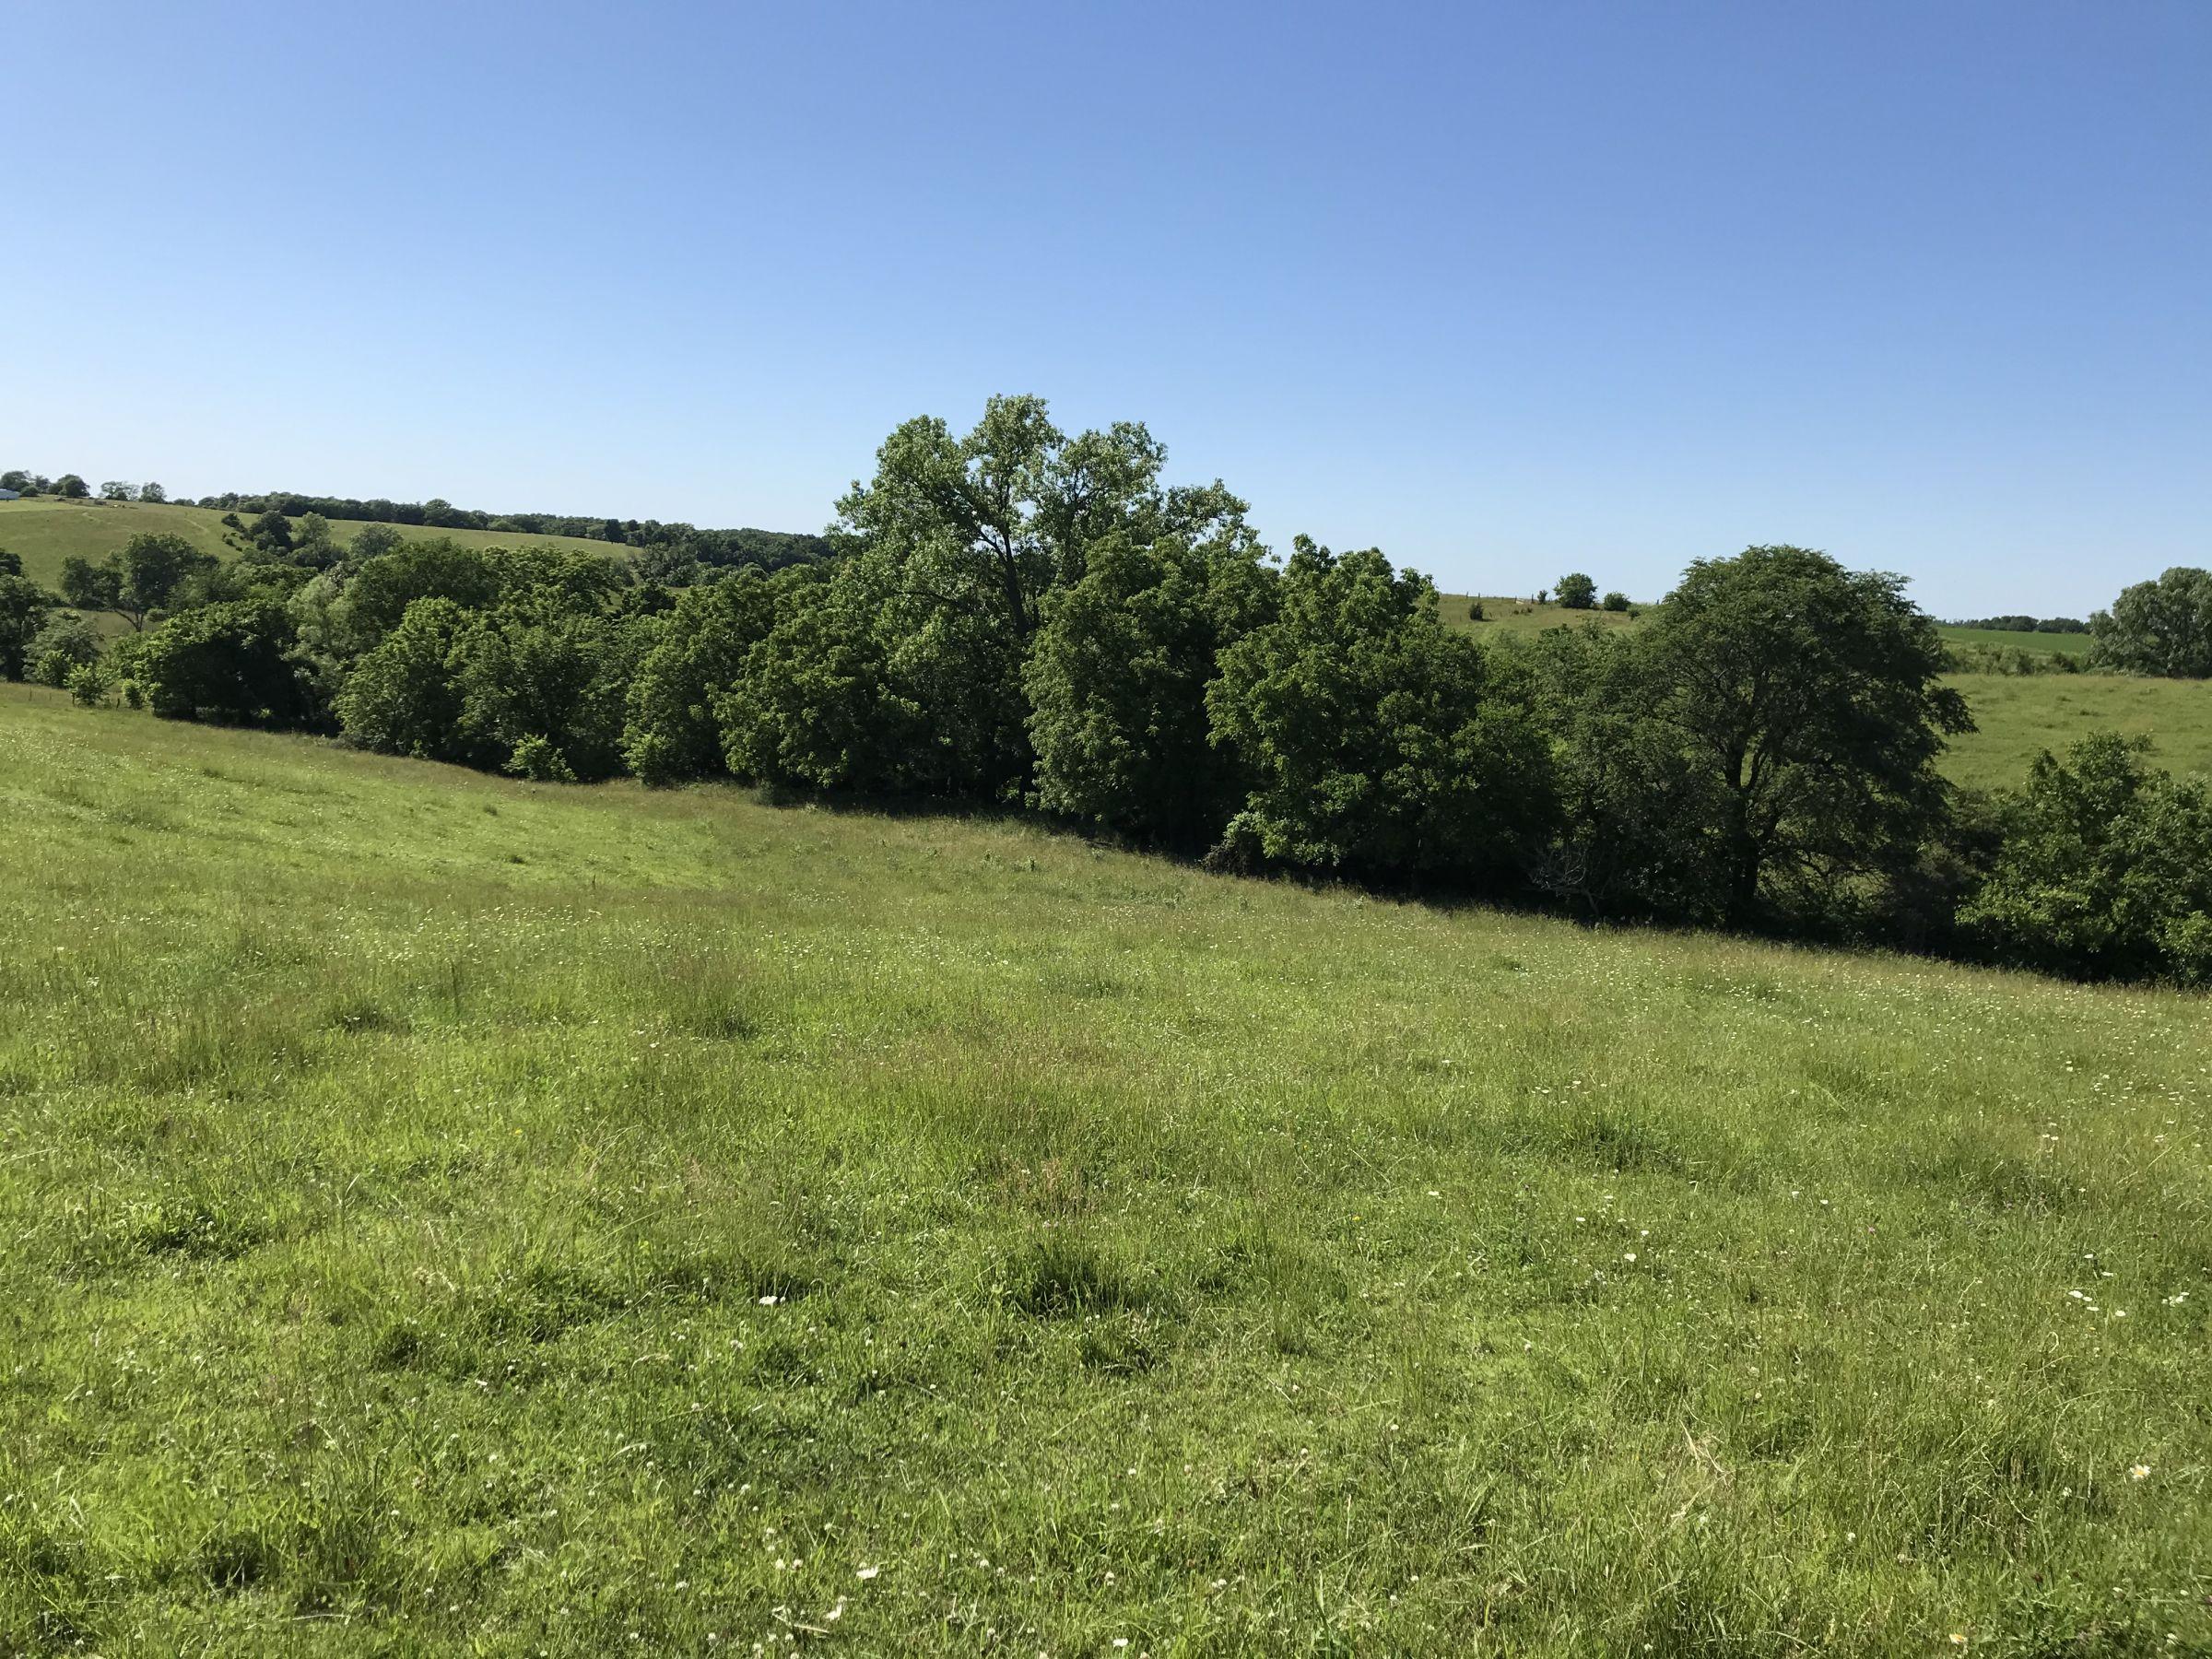 land-warren-county-iowa-20-acres-listing-number-15031-2-2020-06-14-152201.JPG